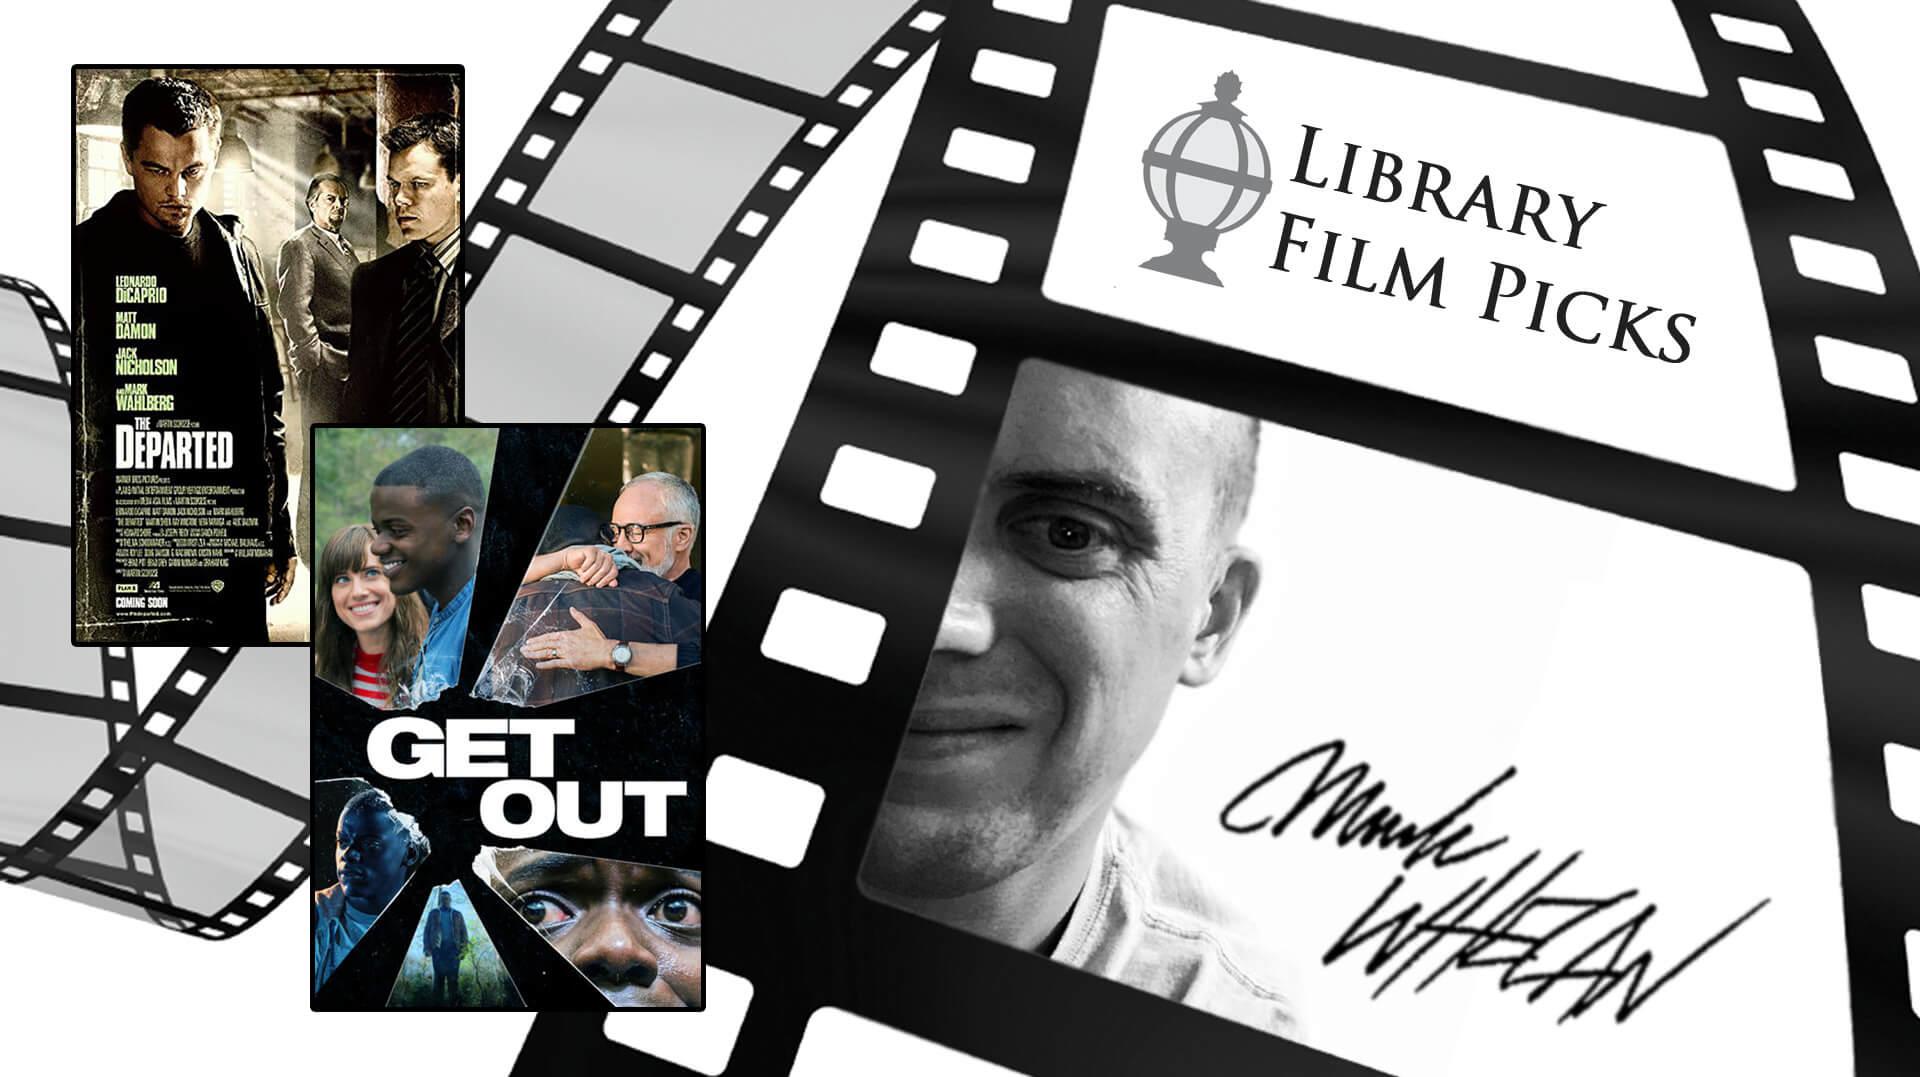 Library Film Picks